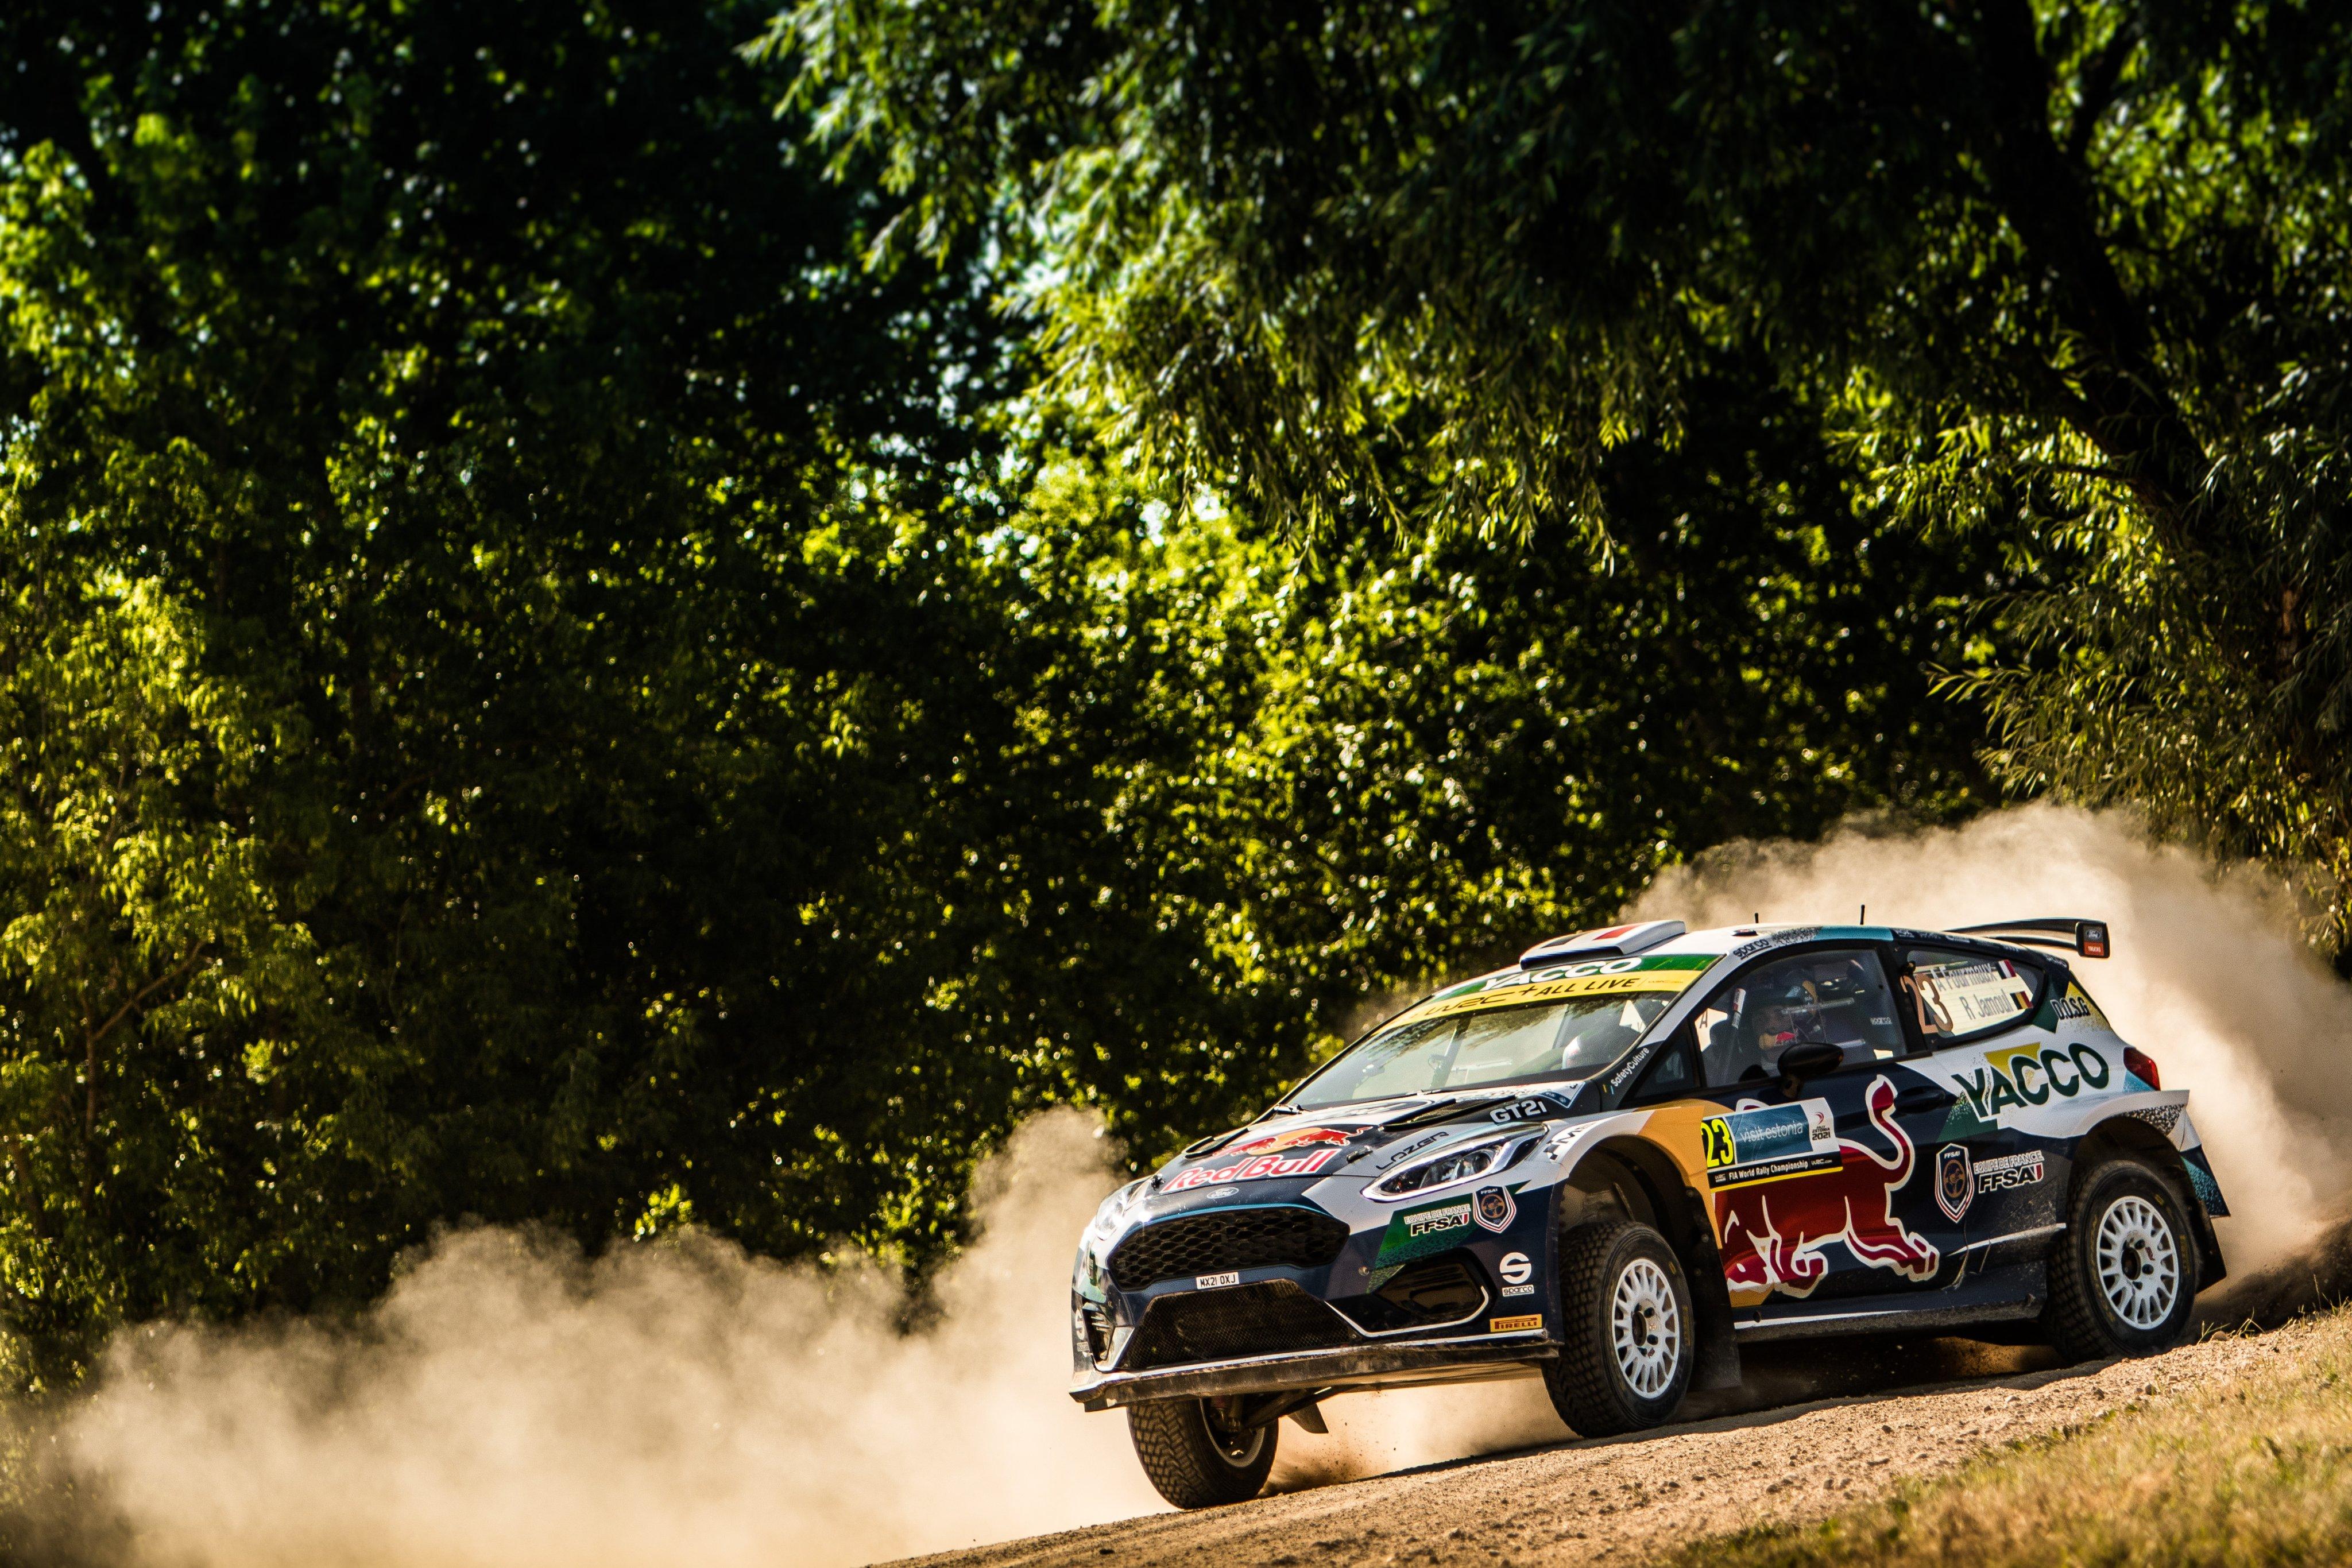 WRC: 11º Rally Estonia [15-18 Julio] - Página 3 E6klWqFWUAExyvj?format=jpg&name=4096x4096